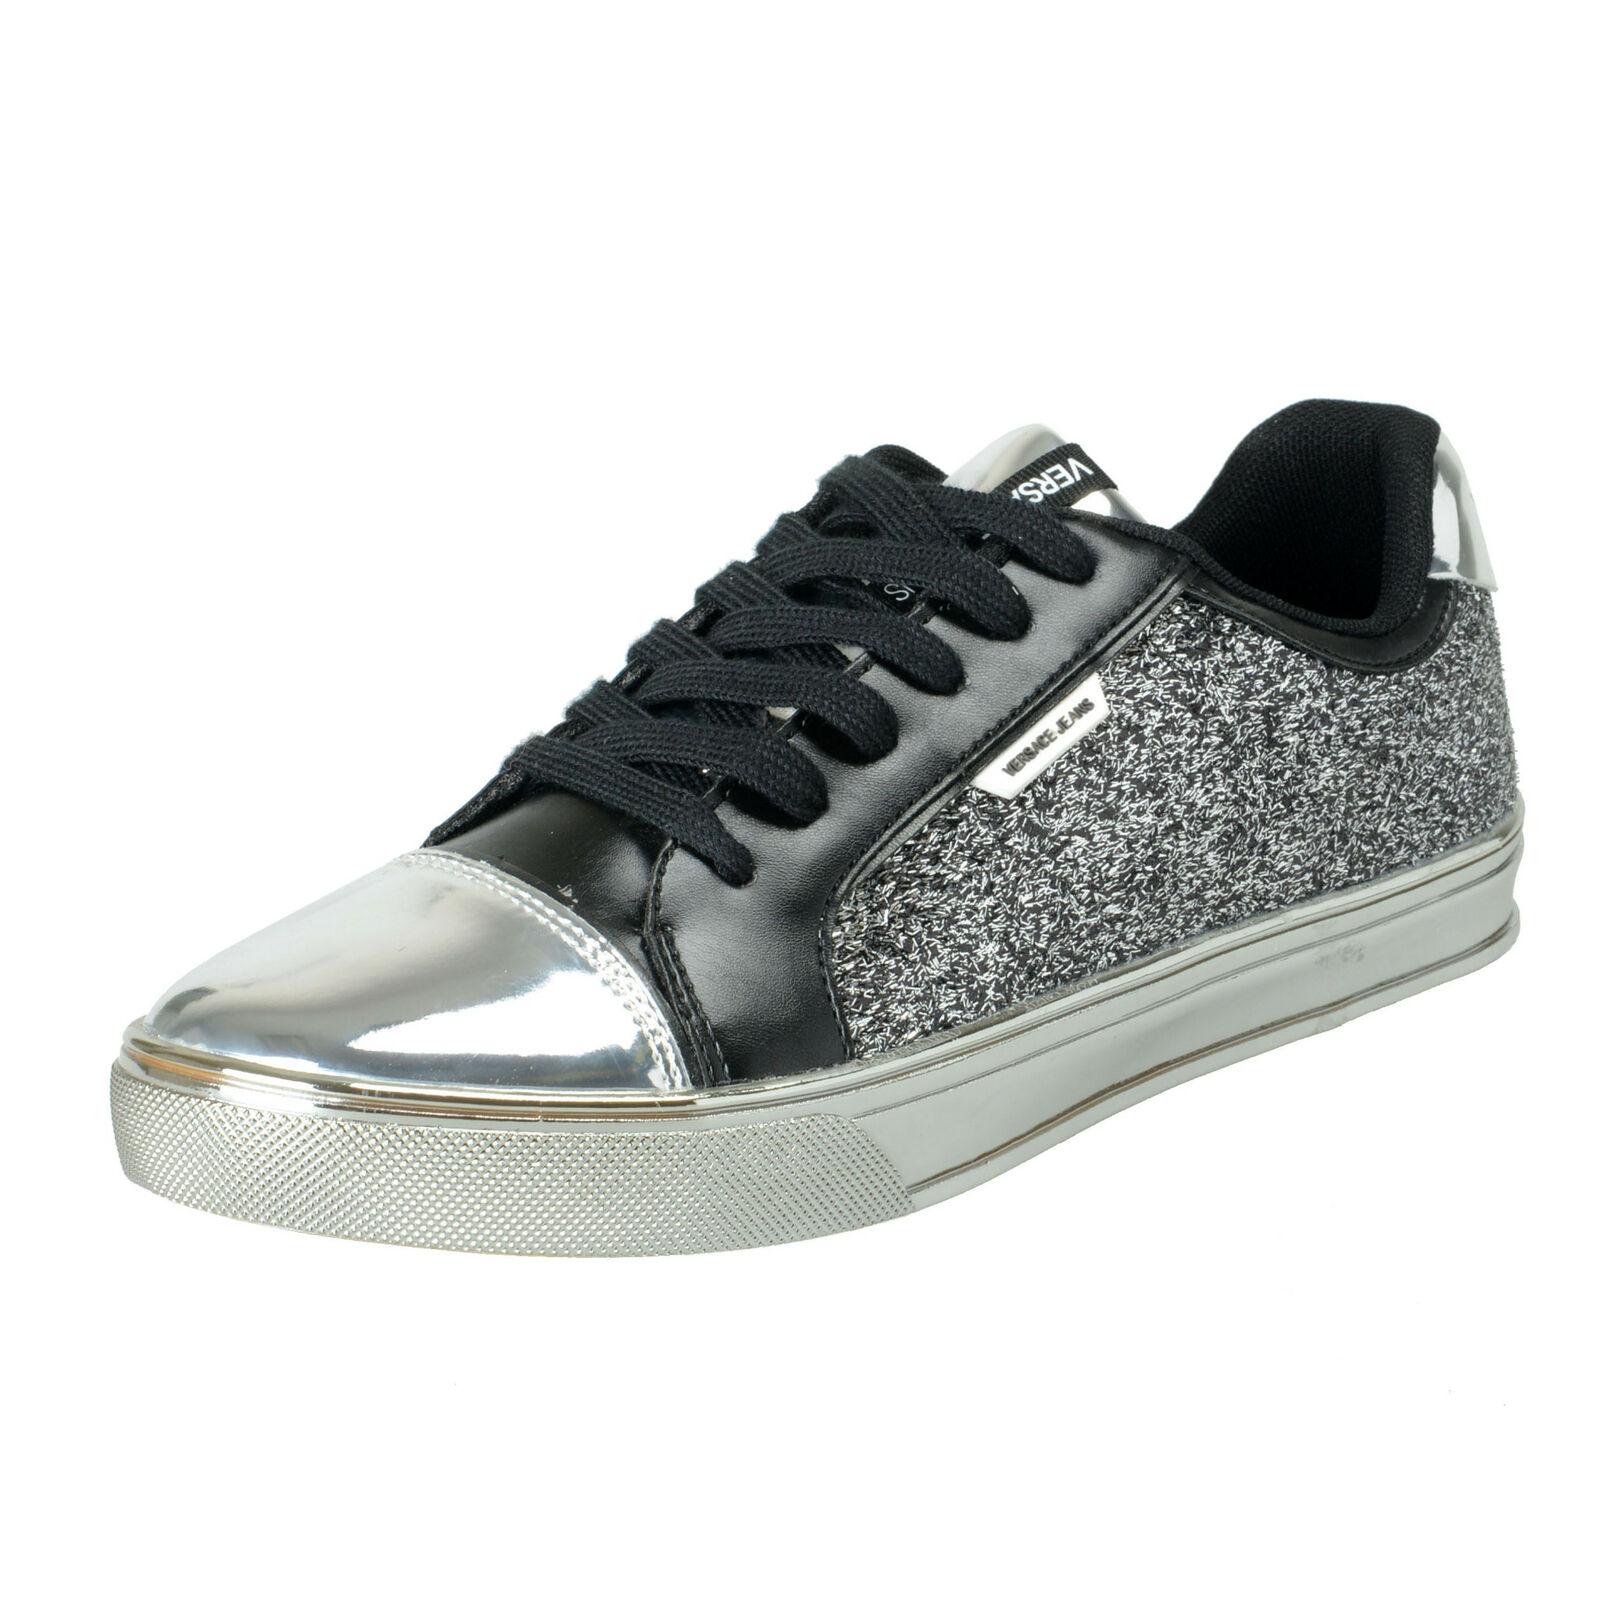 Versace Jeans Women's Sparkle Silver Fashion Sneakers shoes US 11 IT 41